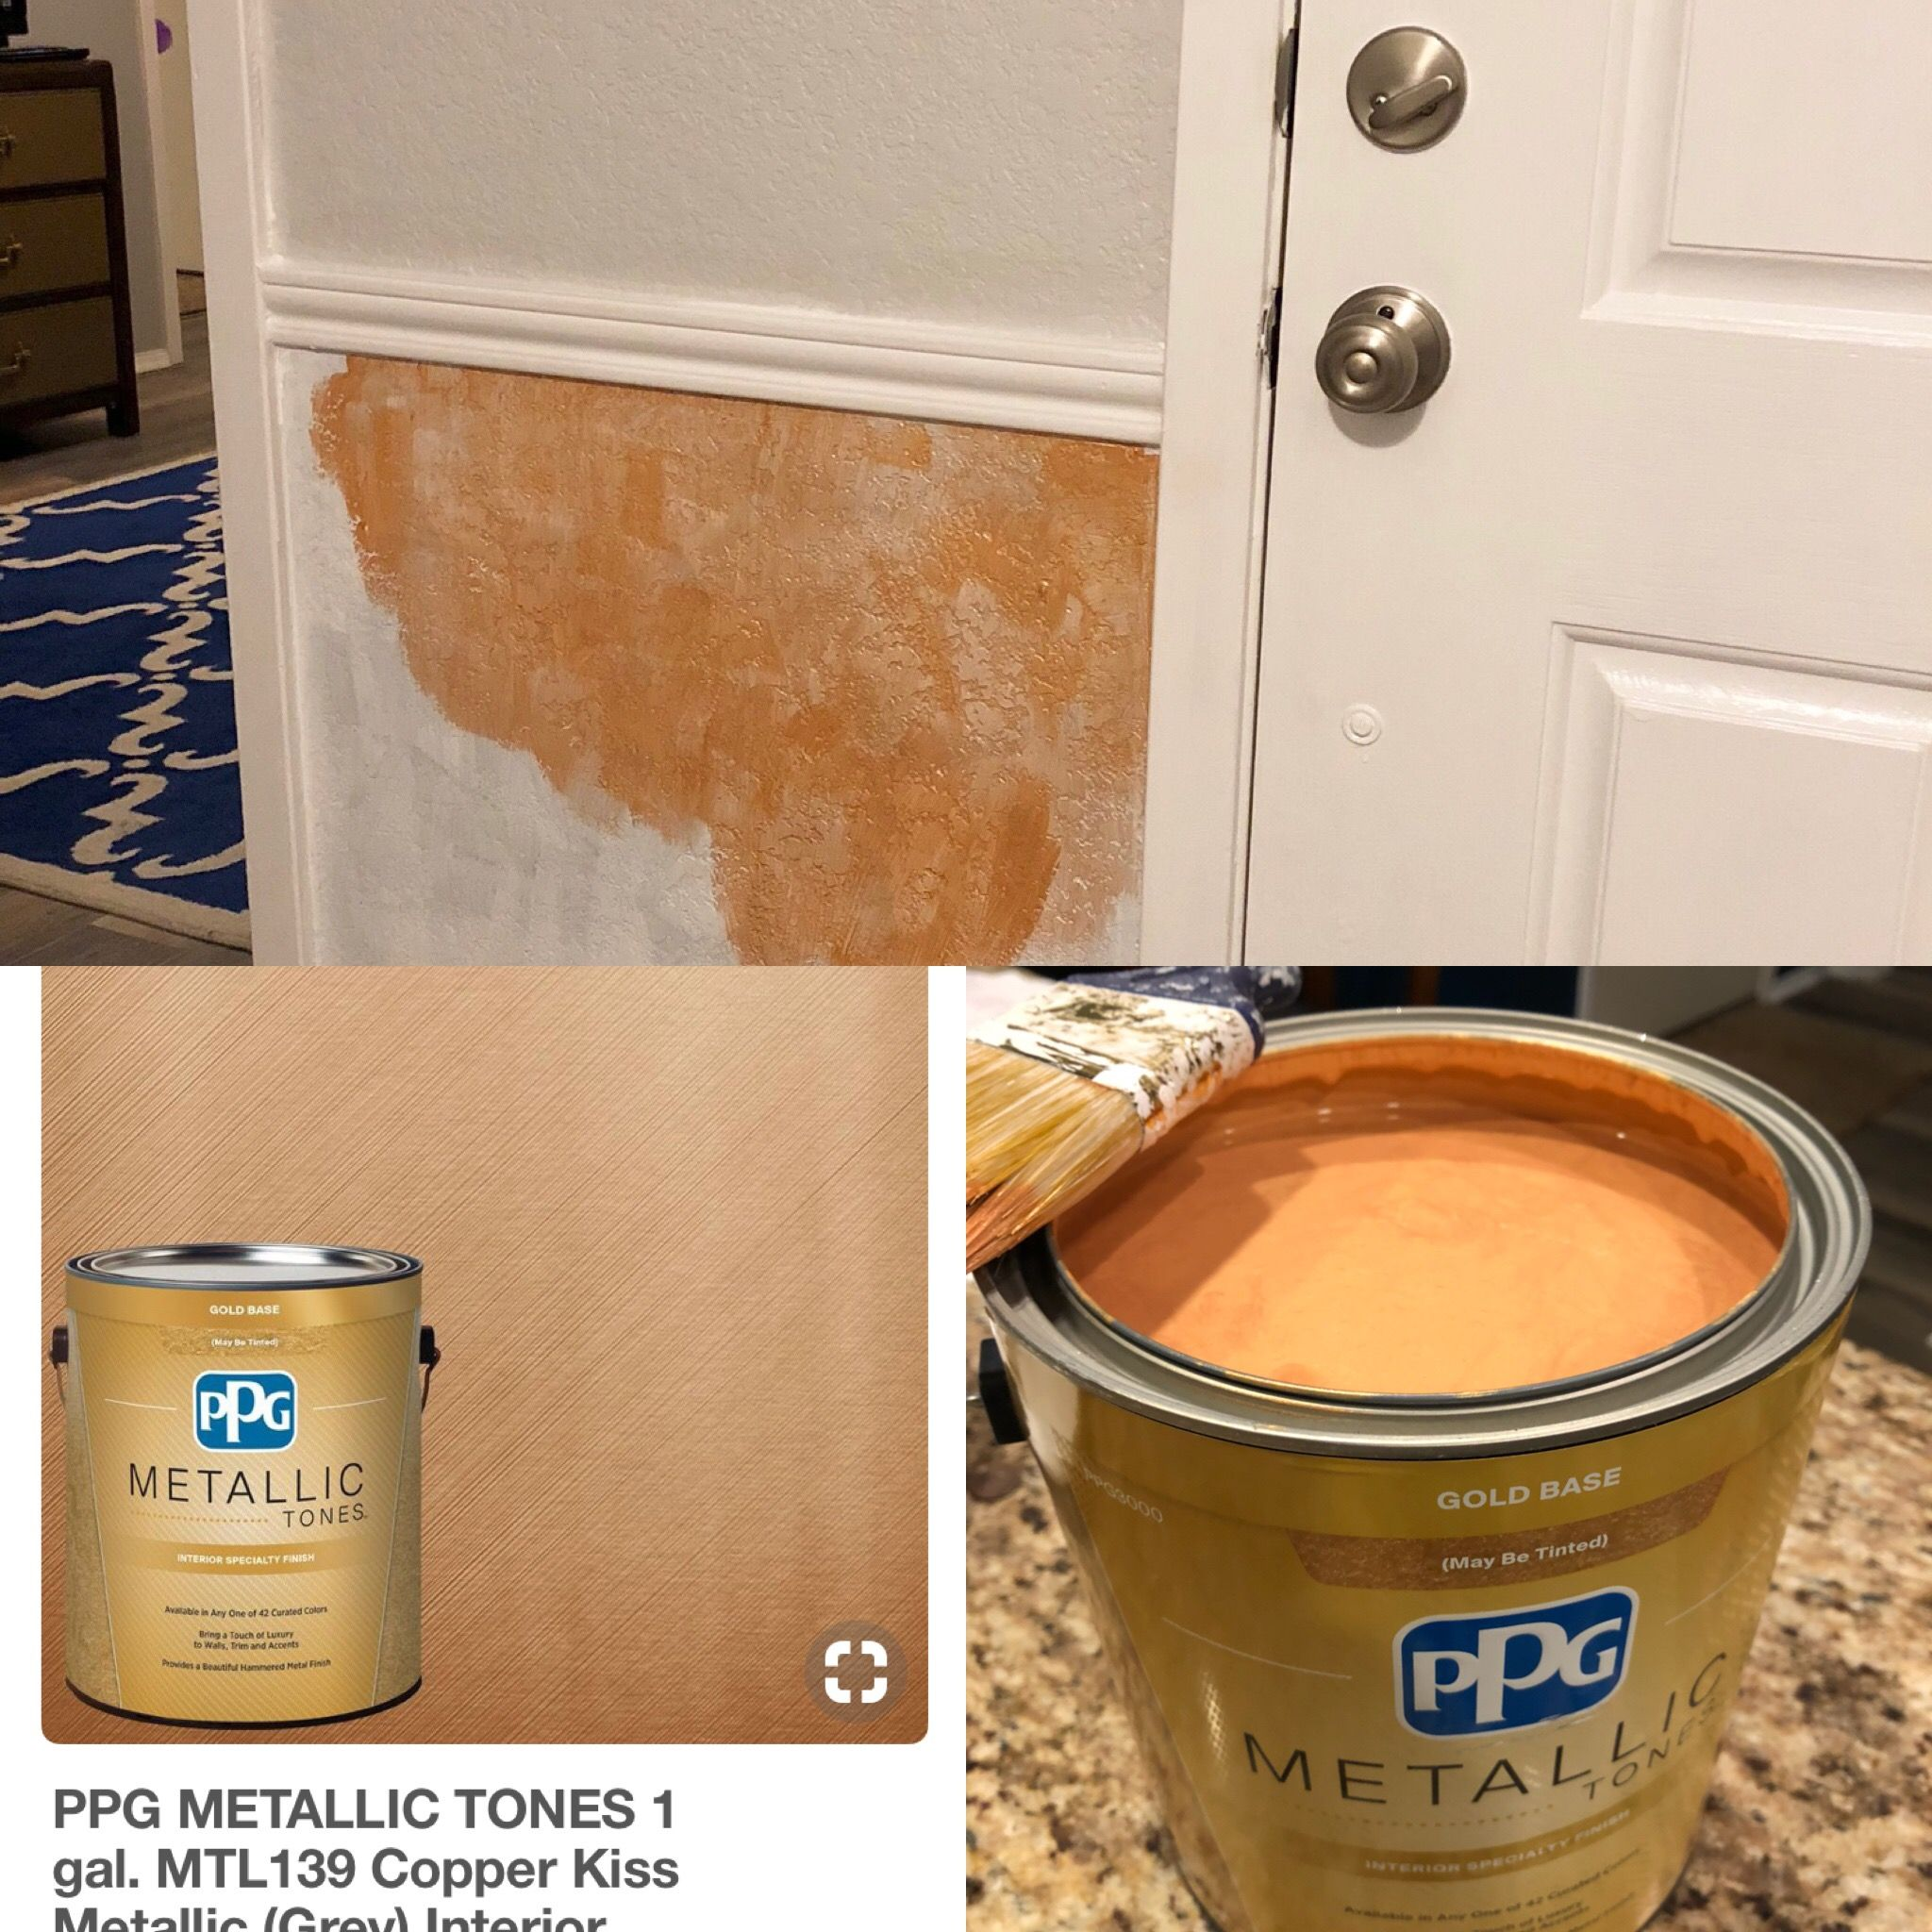 Superbe PPG Metallic Tones Interior Paint: Copper Kiss Is Very Orange. Virginia  House, Interior